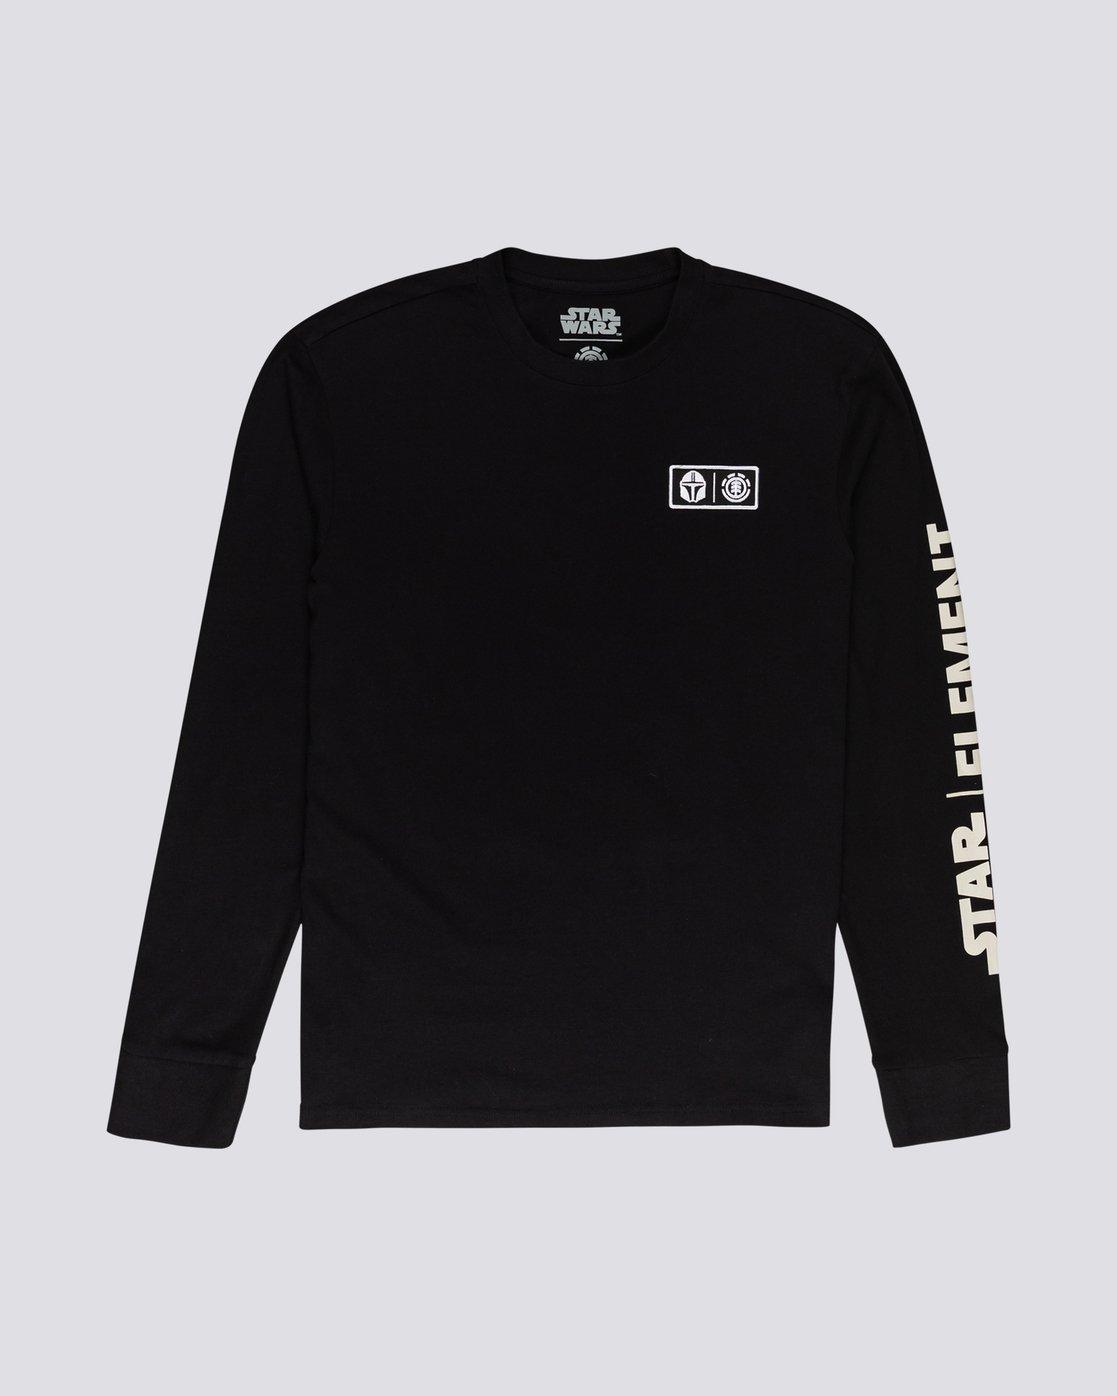 0 Star Wars X Element Nâ°11 The Child Long Sleeve T Shirt  104051 Element